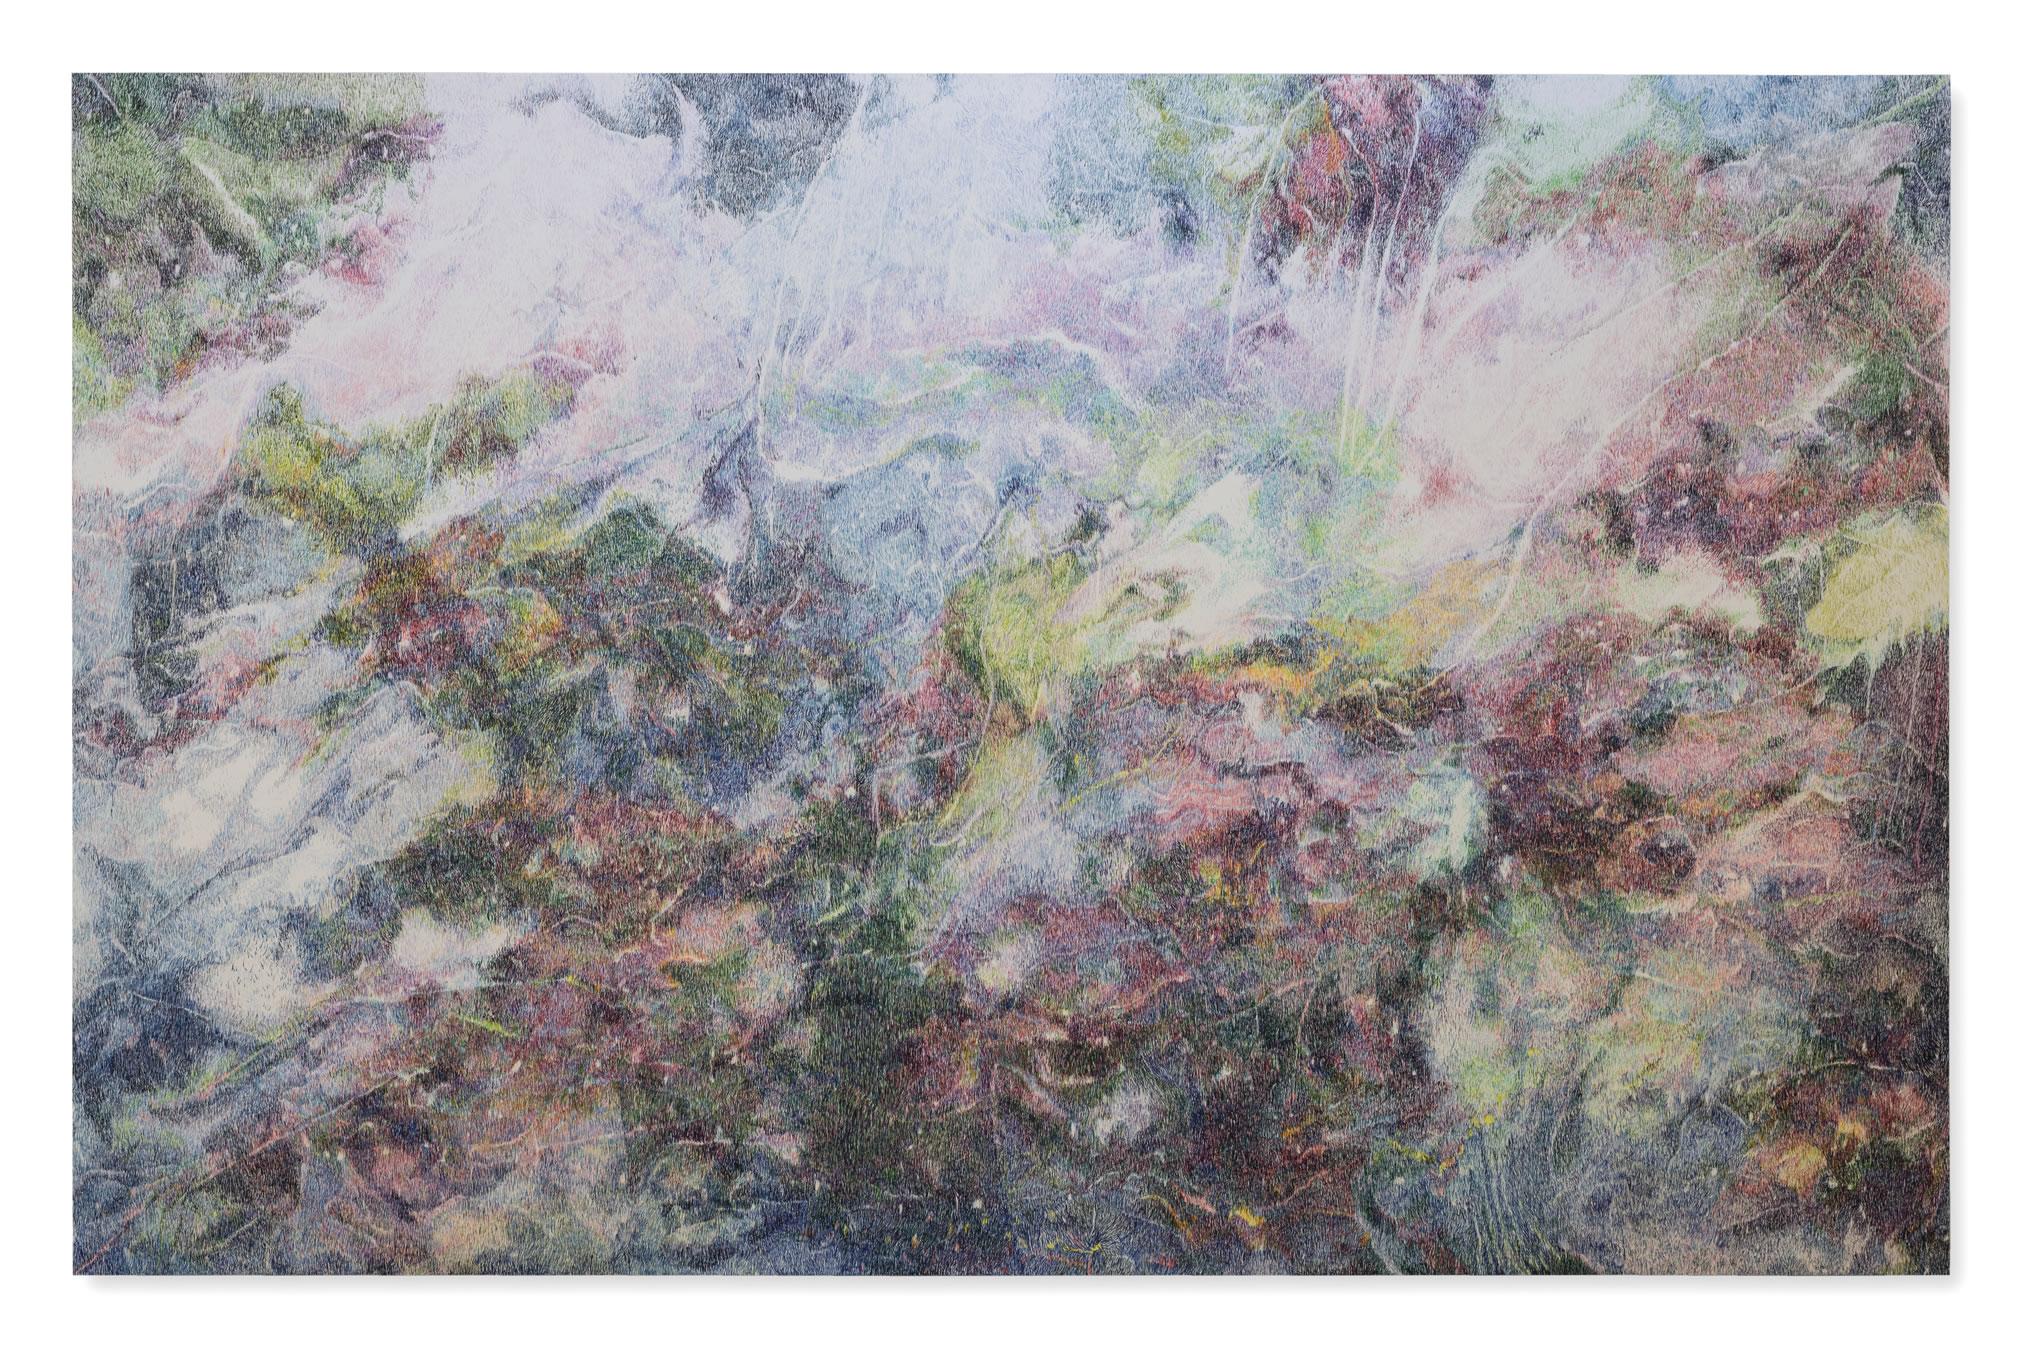 Galerie3 | Linda Berger | Fact 14 | 2018 | 140 x 218 cm-Art-Austria-2018 | Foto: Bastian Schwind